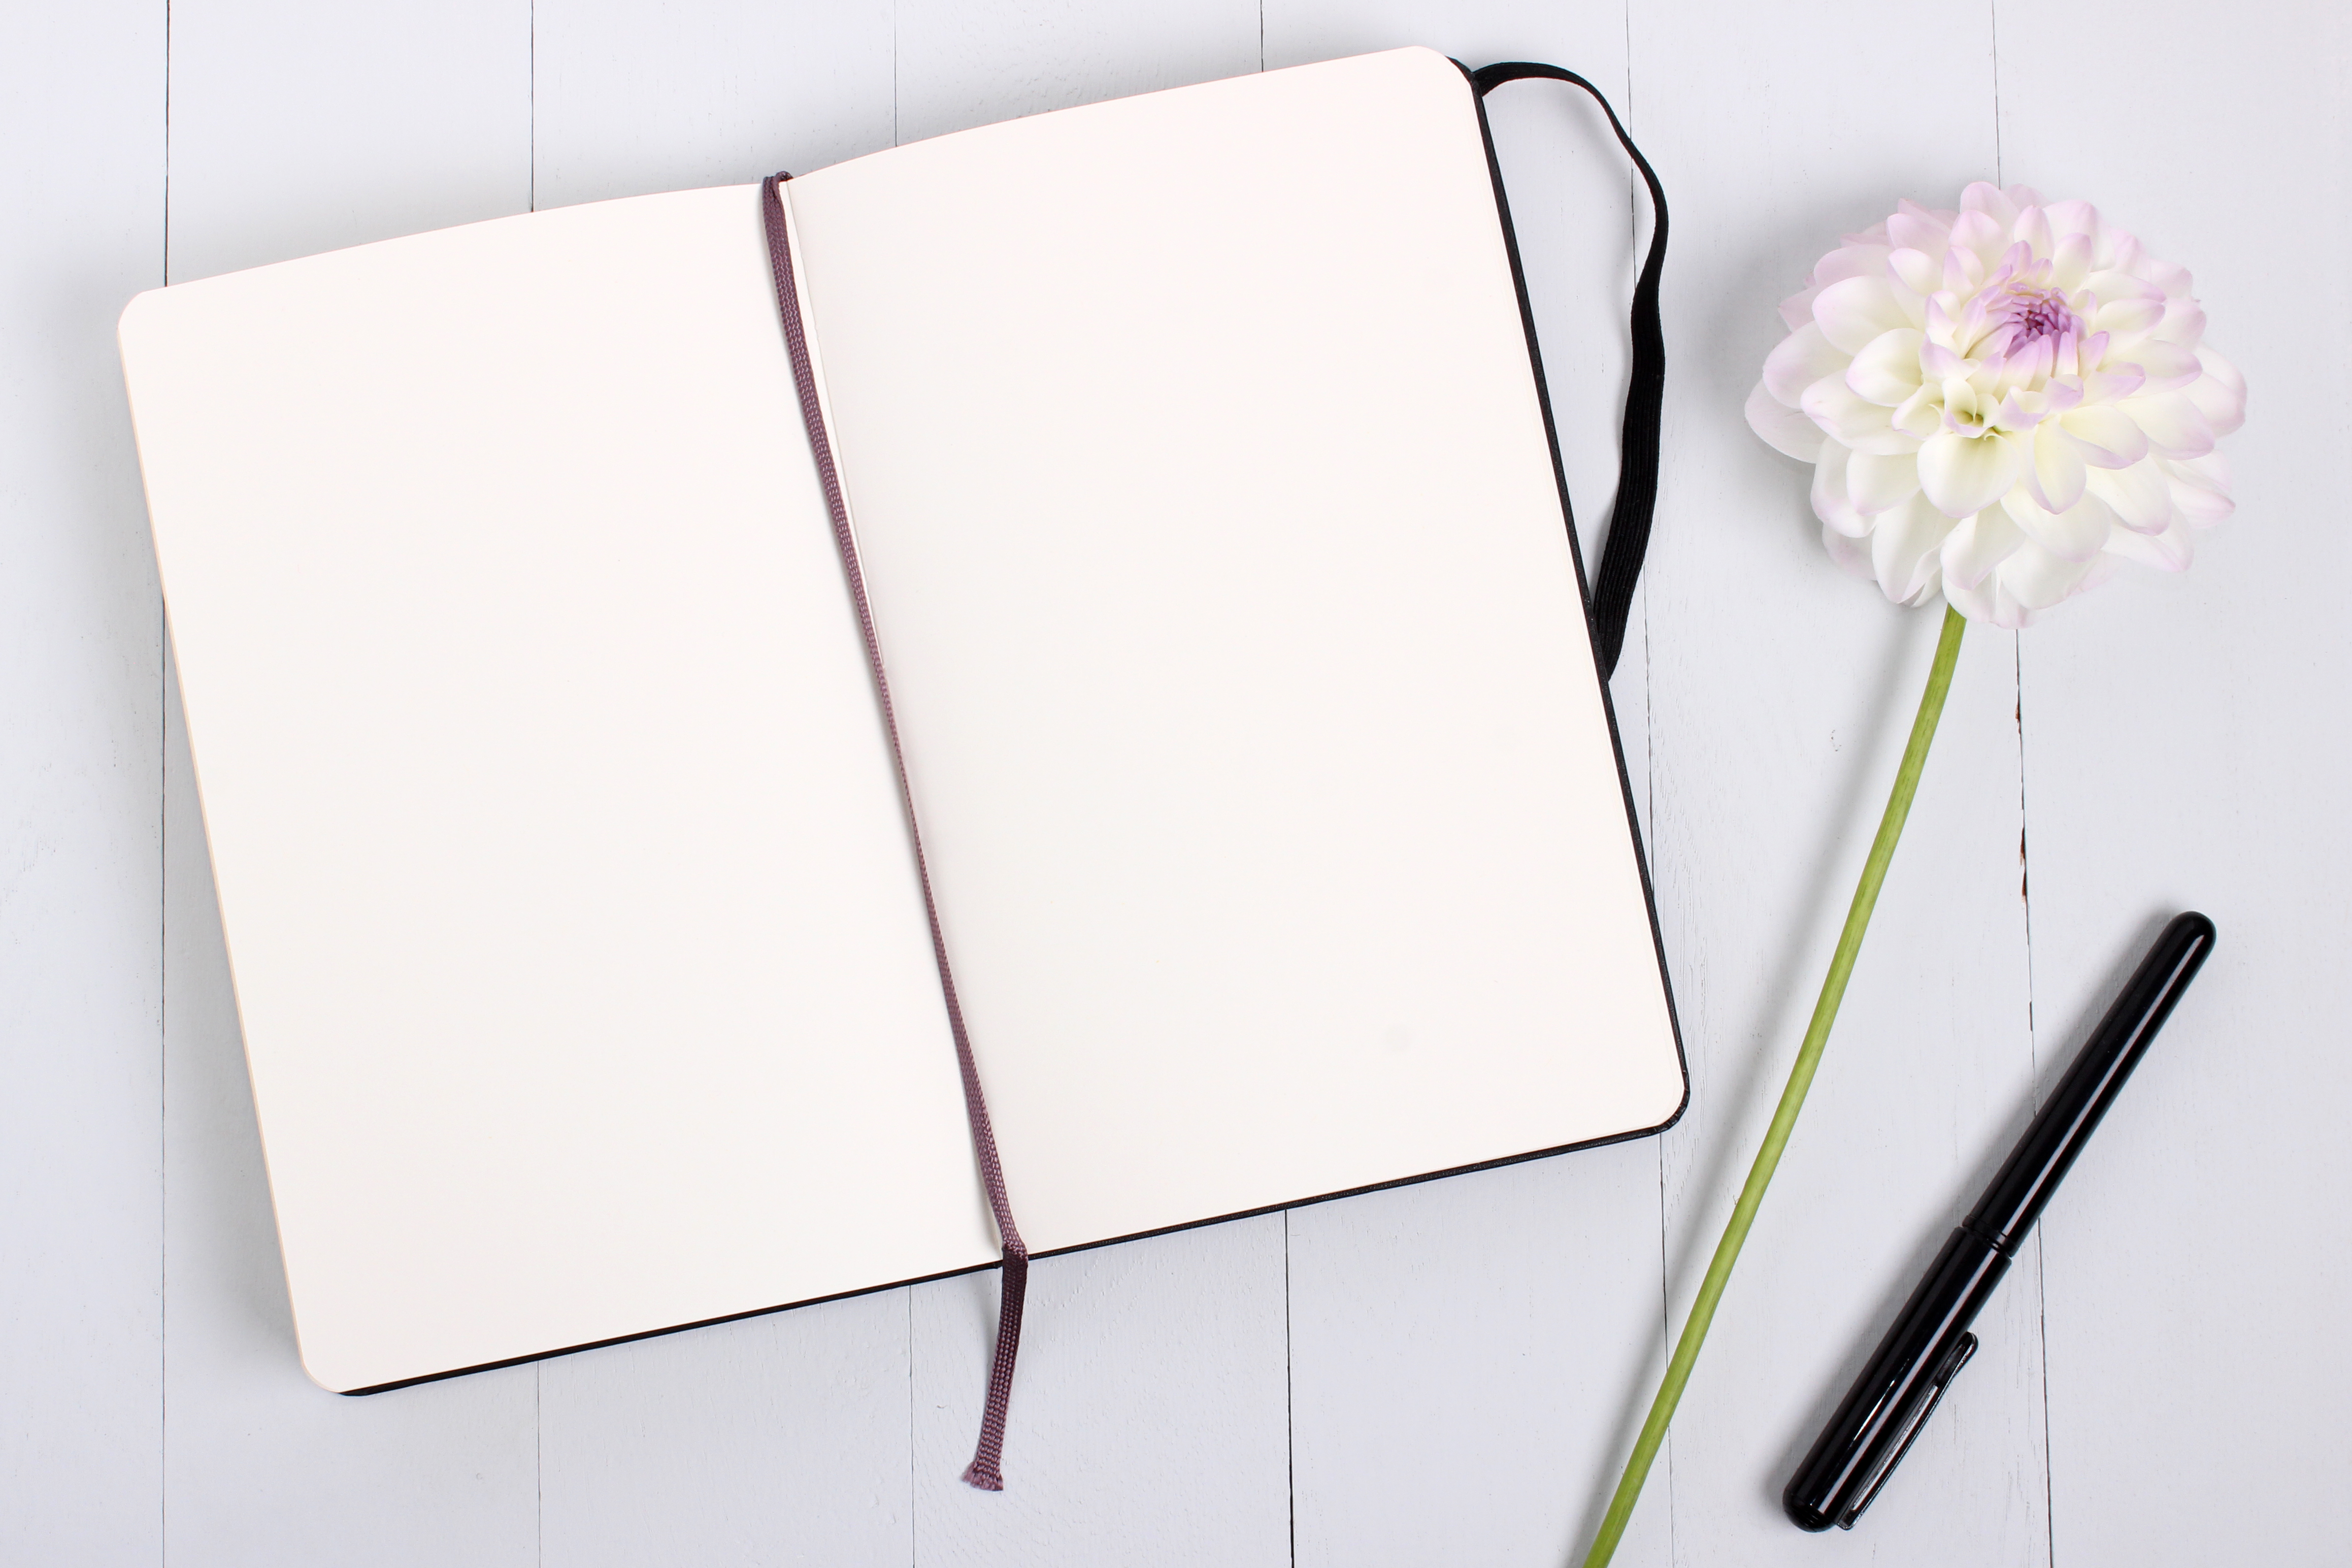 Canva - Notebook And Black Ballpoint Pen